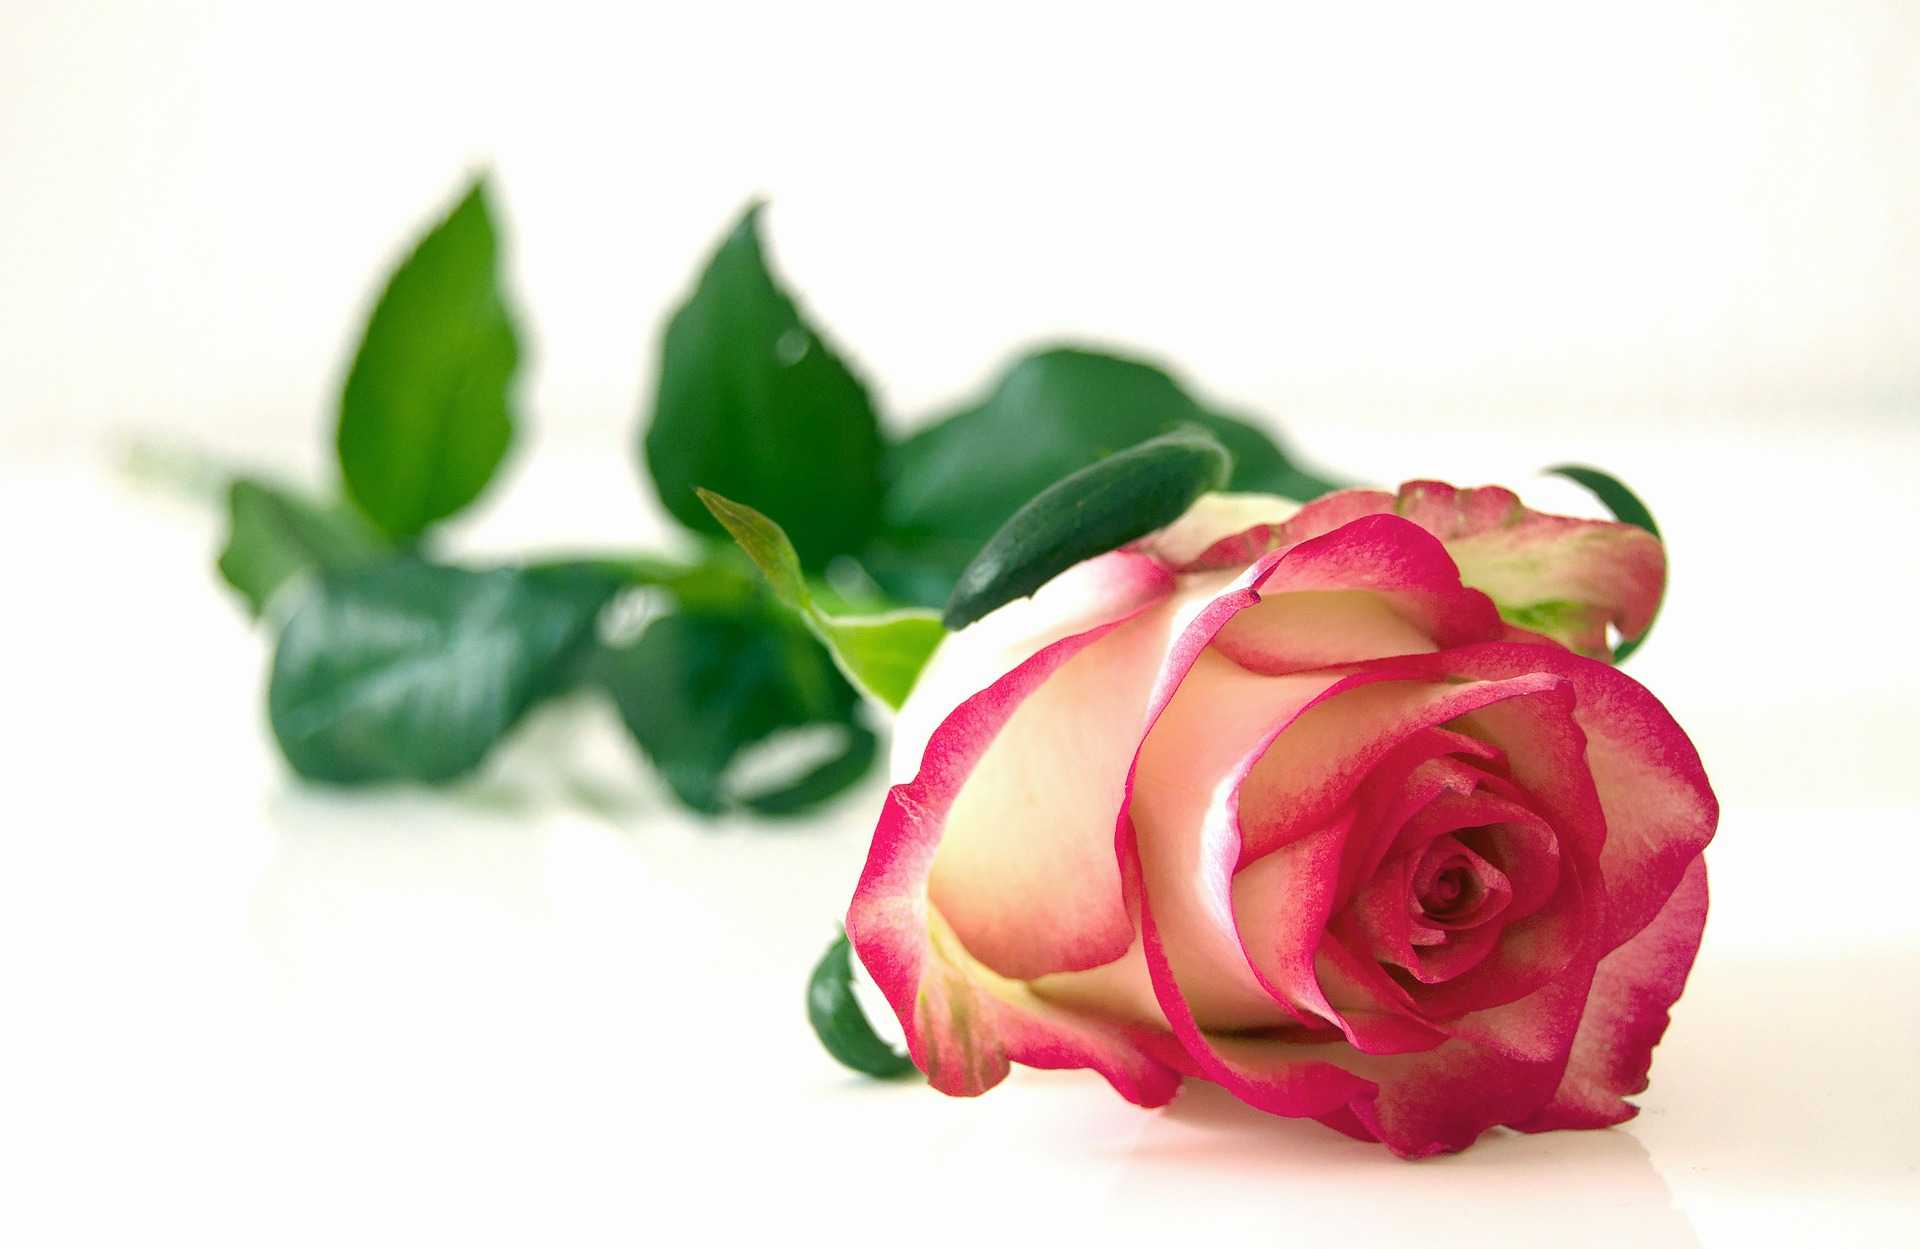 rose-301406_1920.jpg